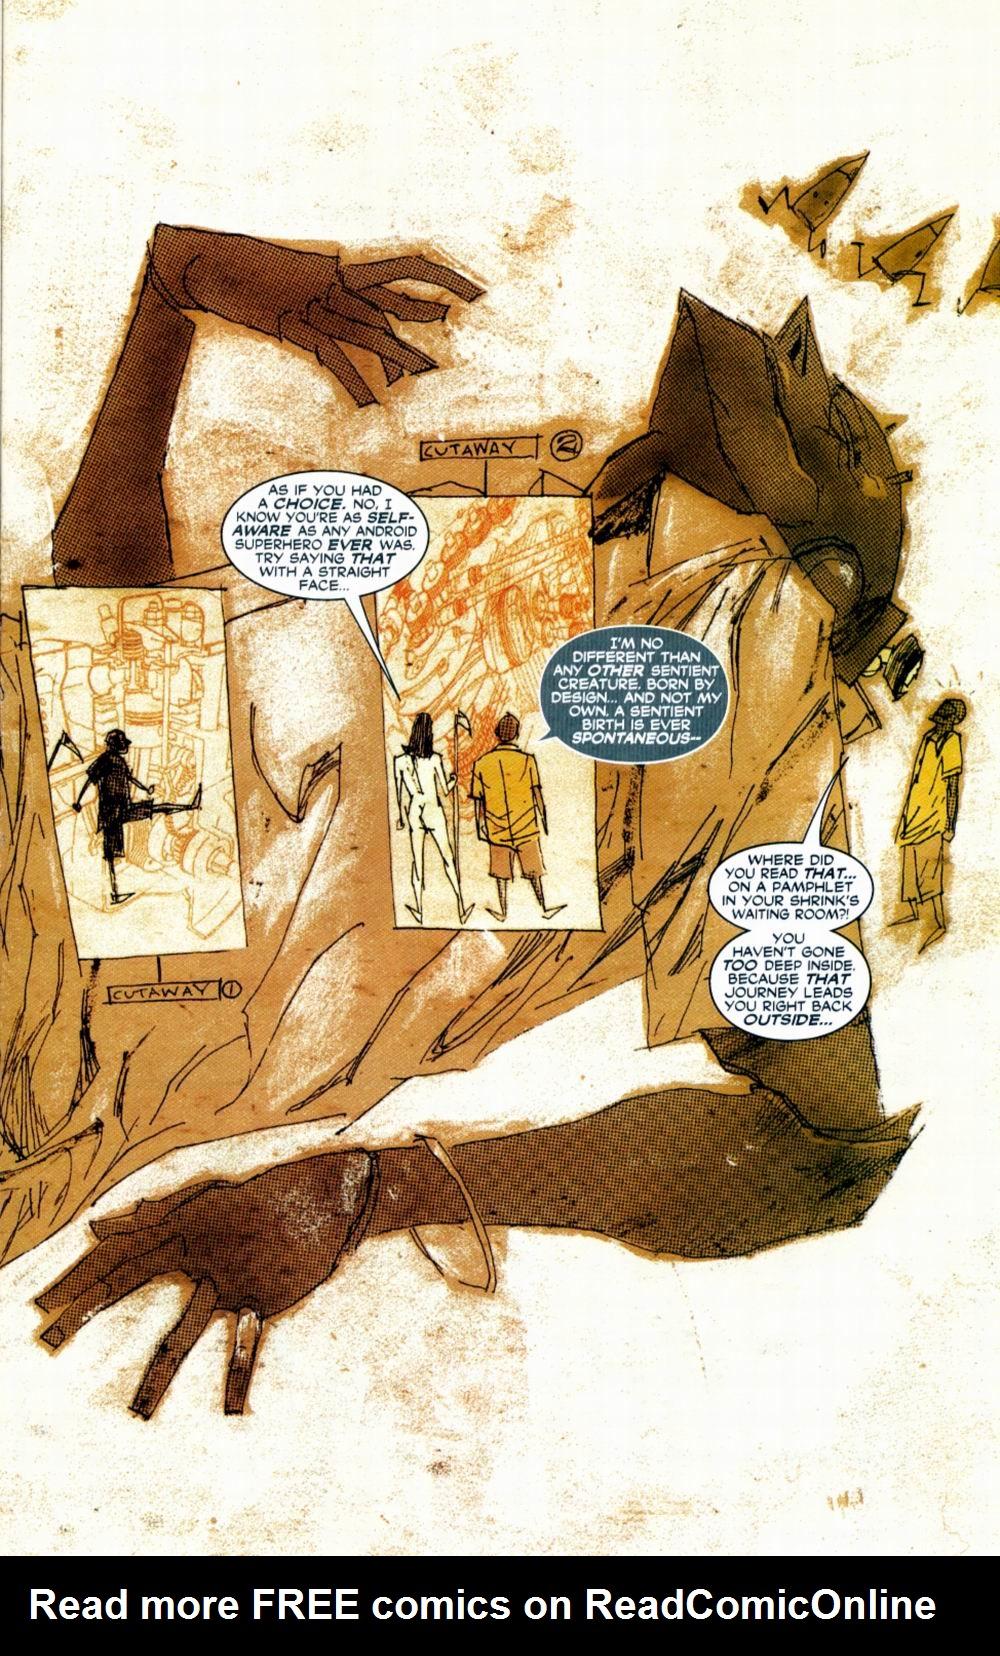 Read online Automatic Kafka comic -  Issue #1 - 16